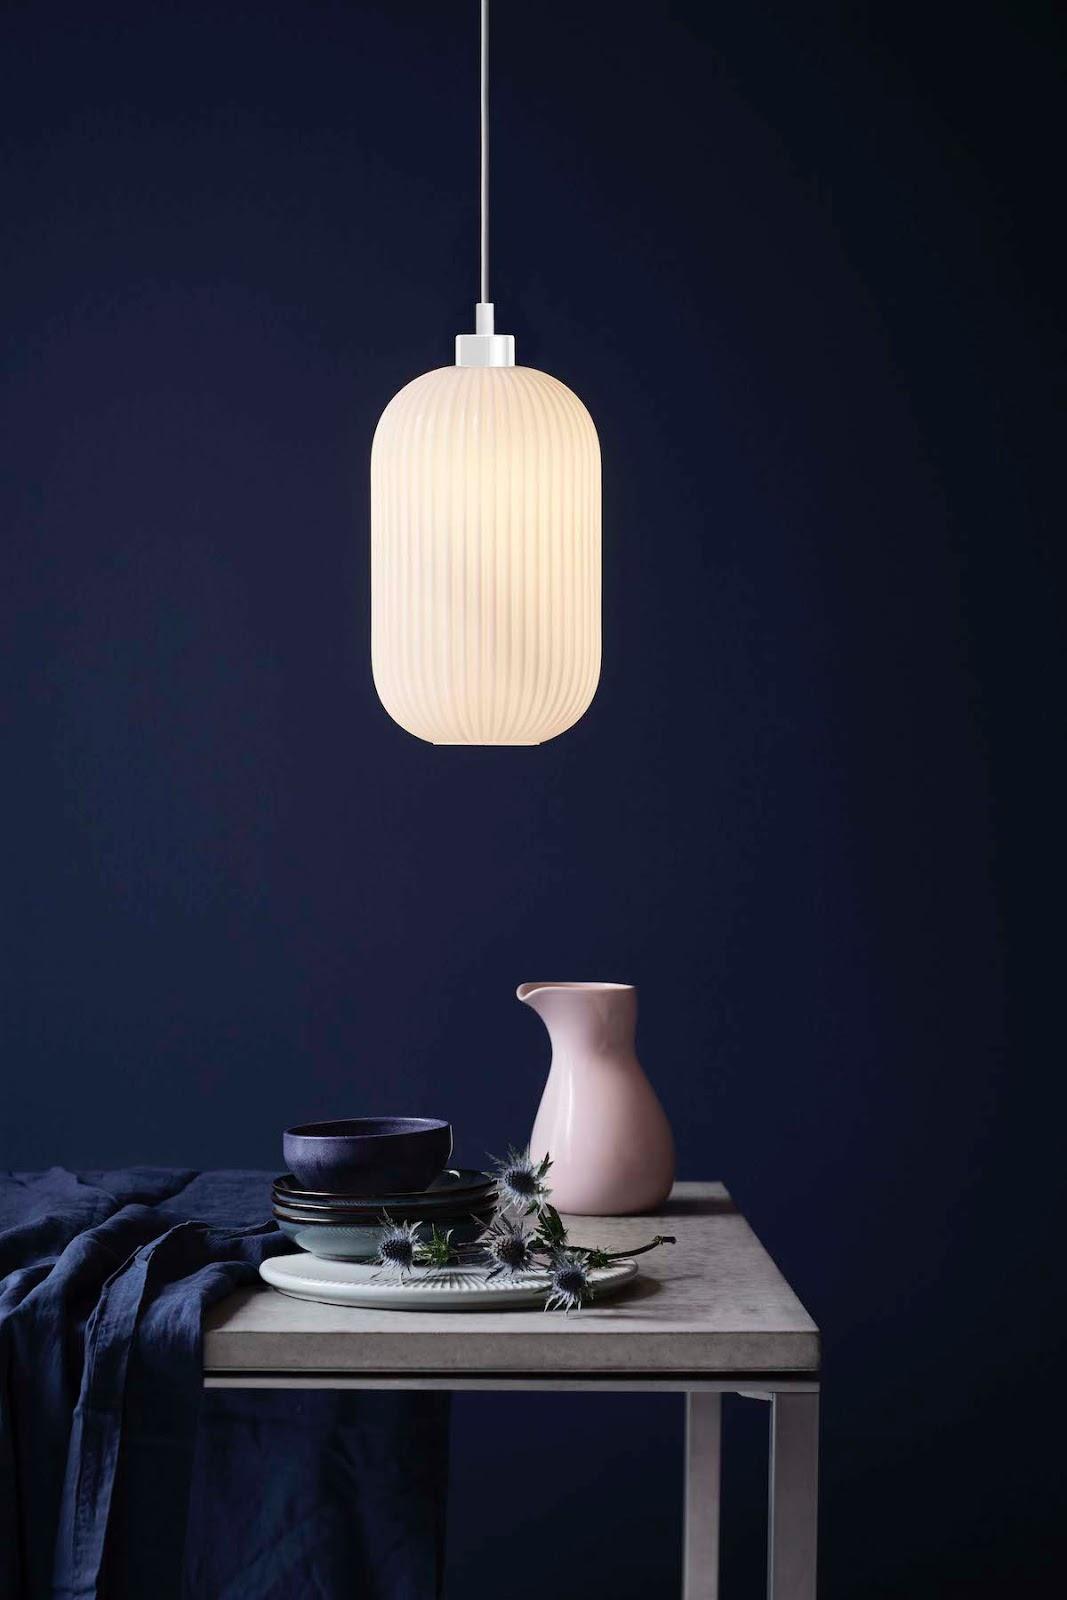 Lámpara colgante minimalista